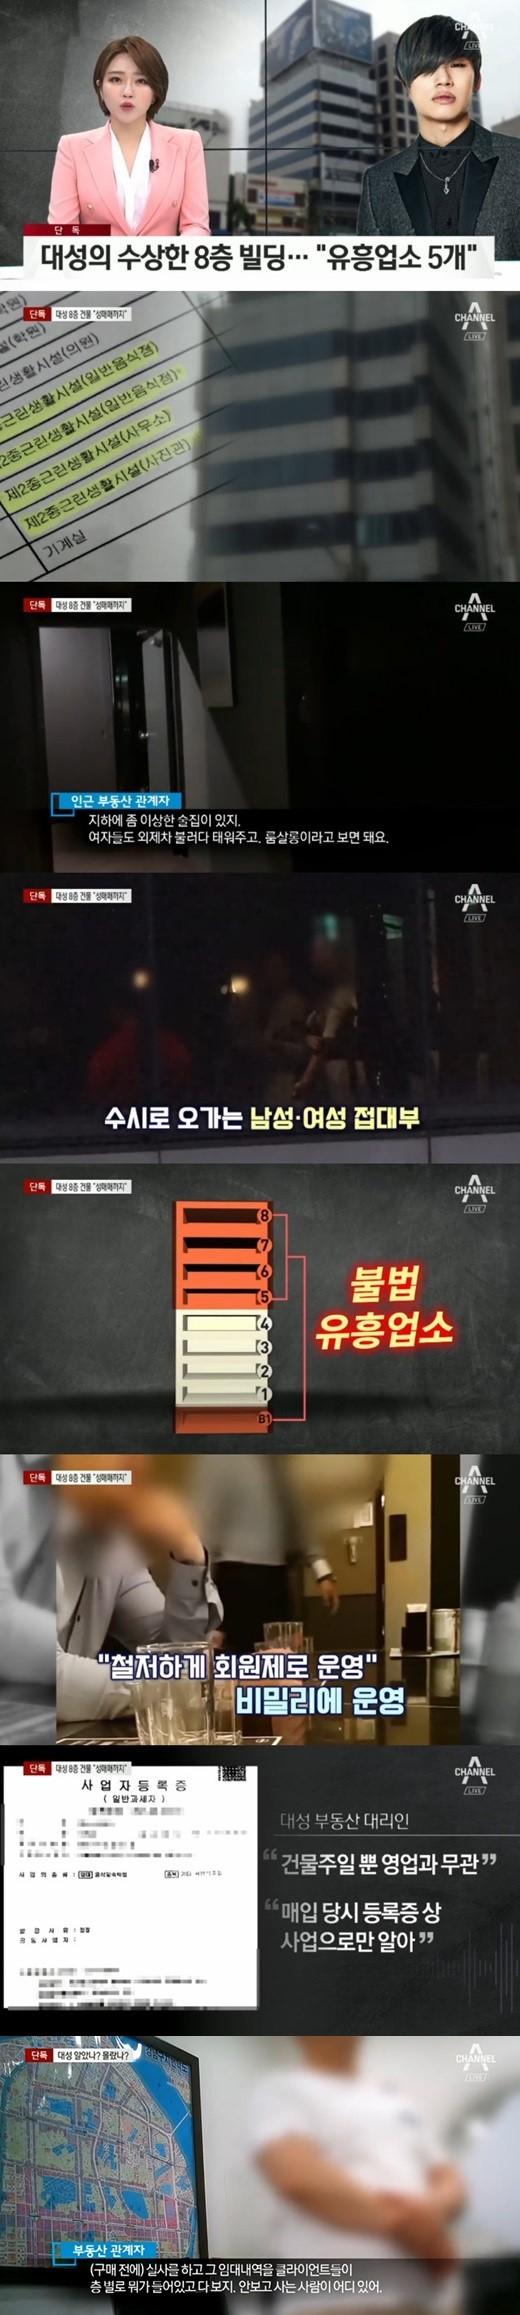 BIGBANG成员姜大声被爆名下房产内有非法娱乐场所